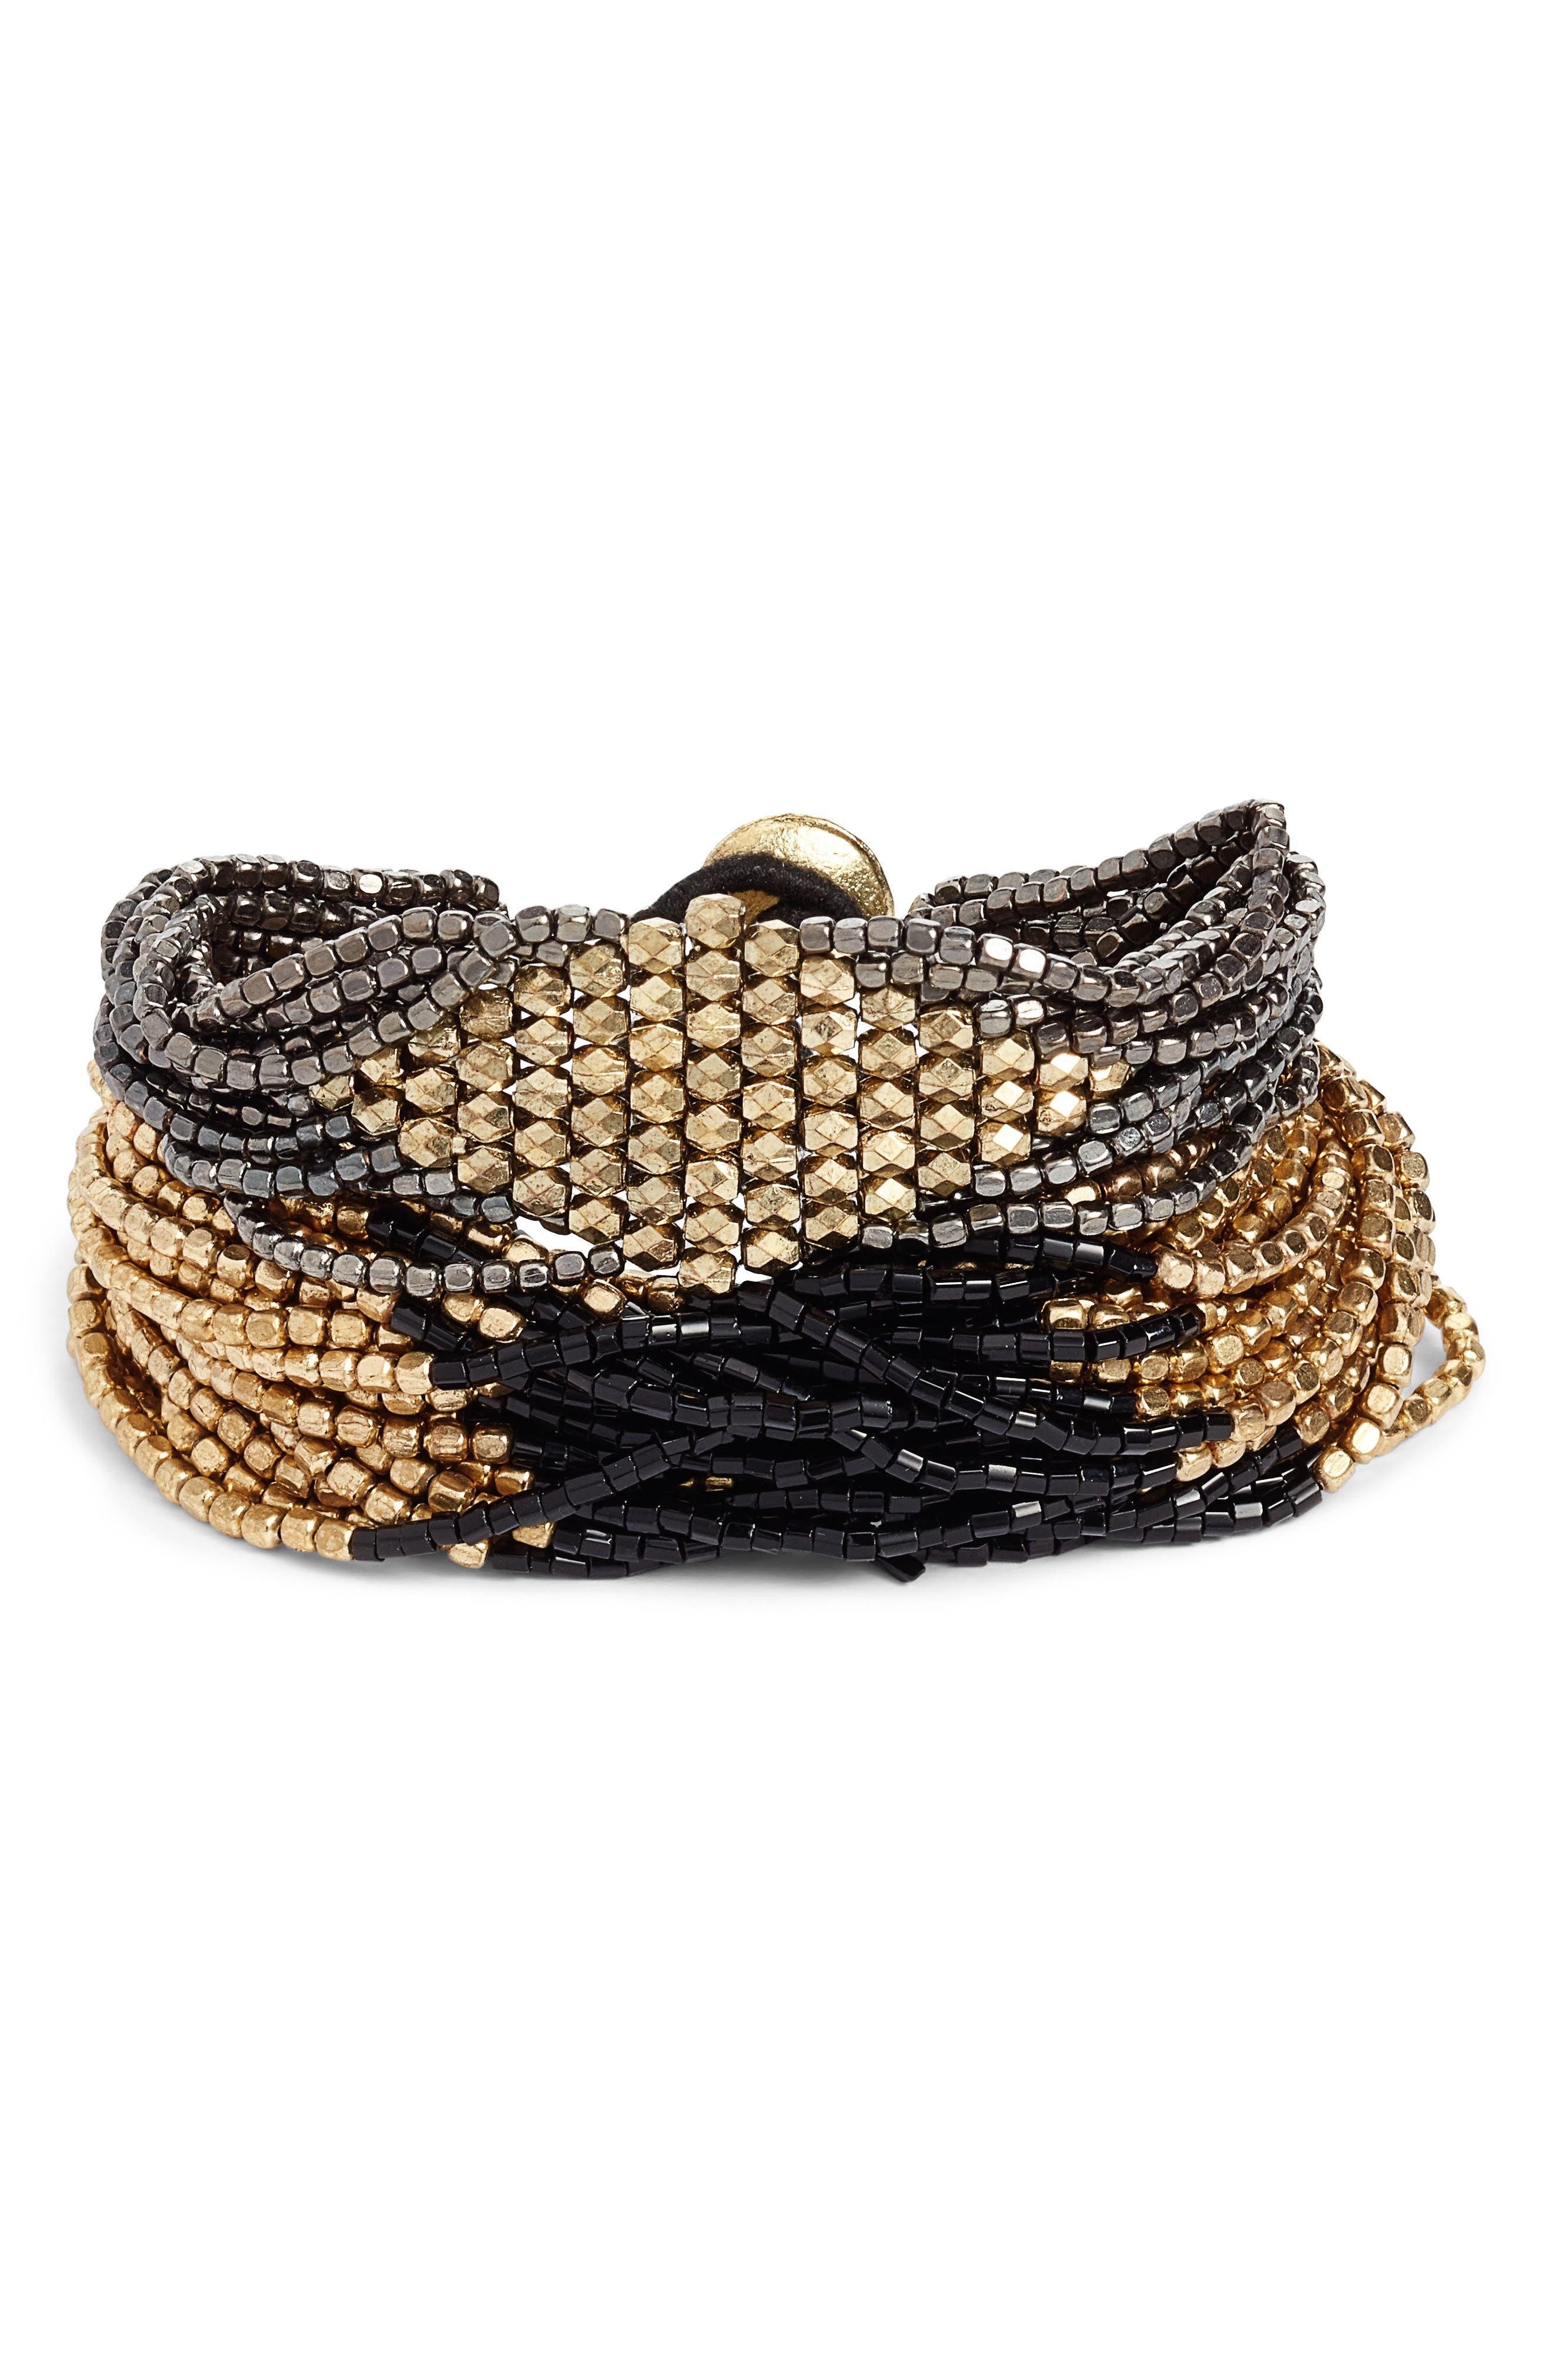 INK + ALLOY Set of 2 Beaded Bracelets